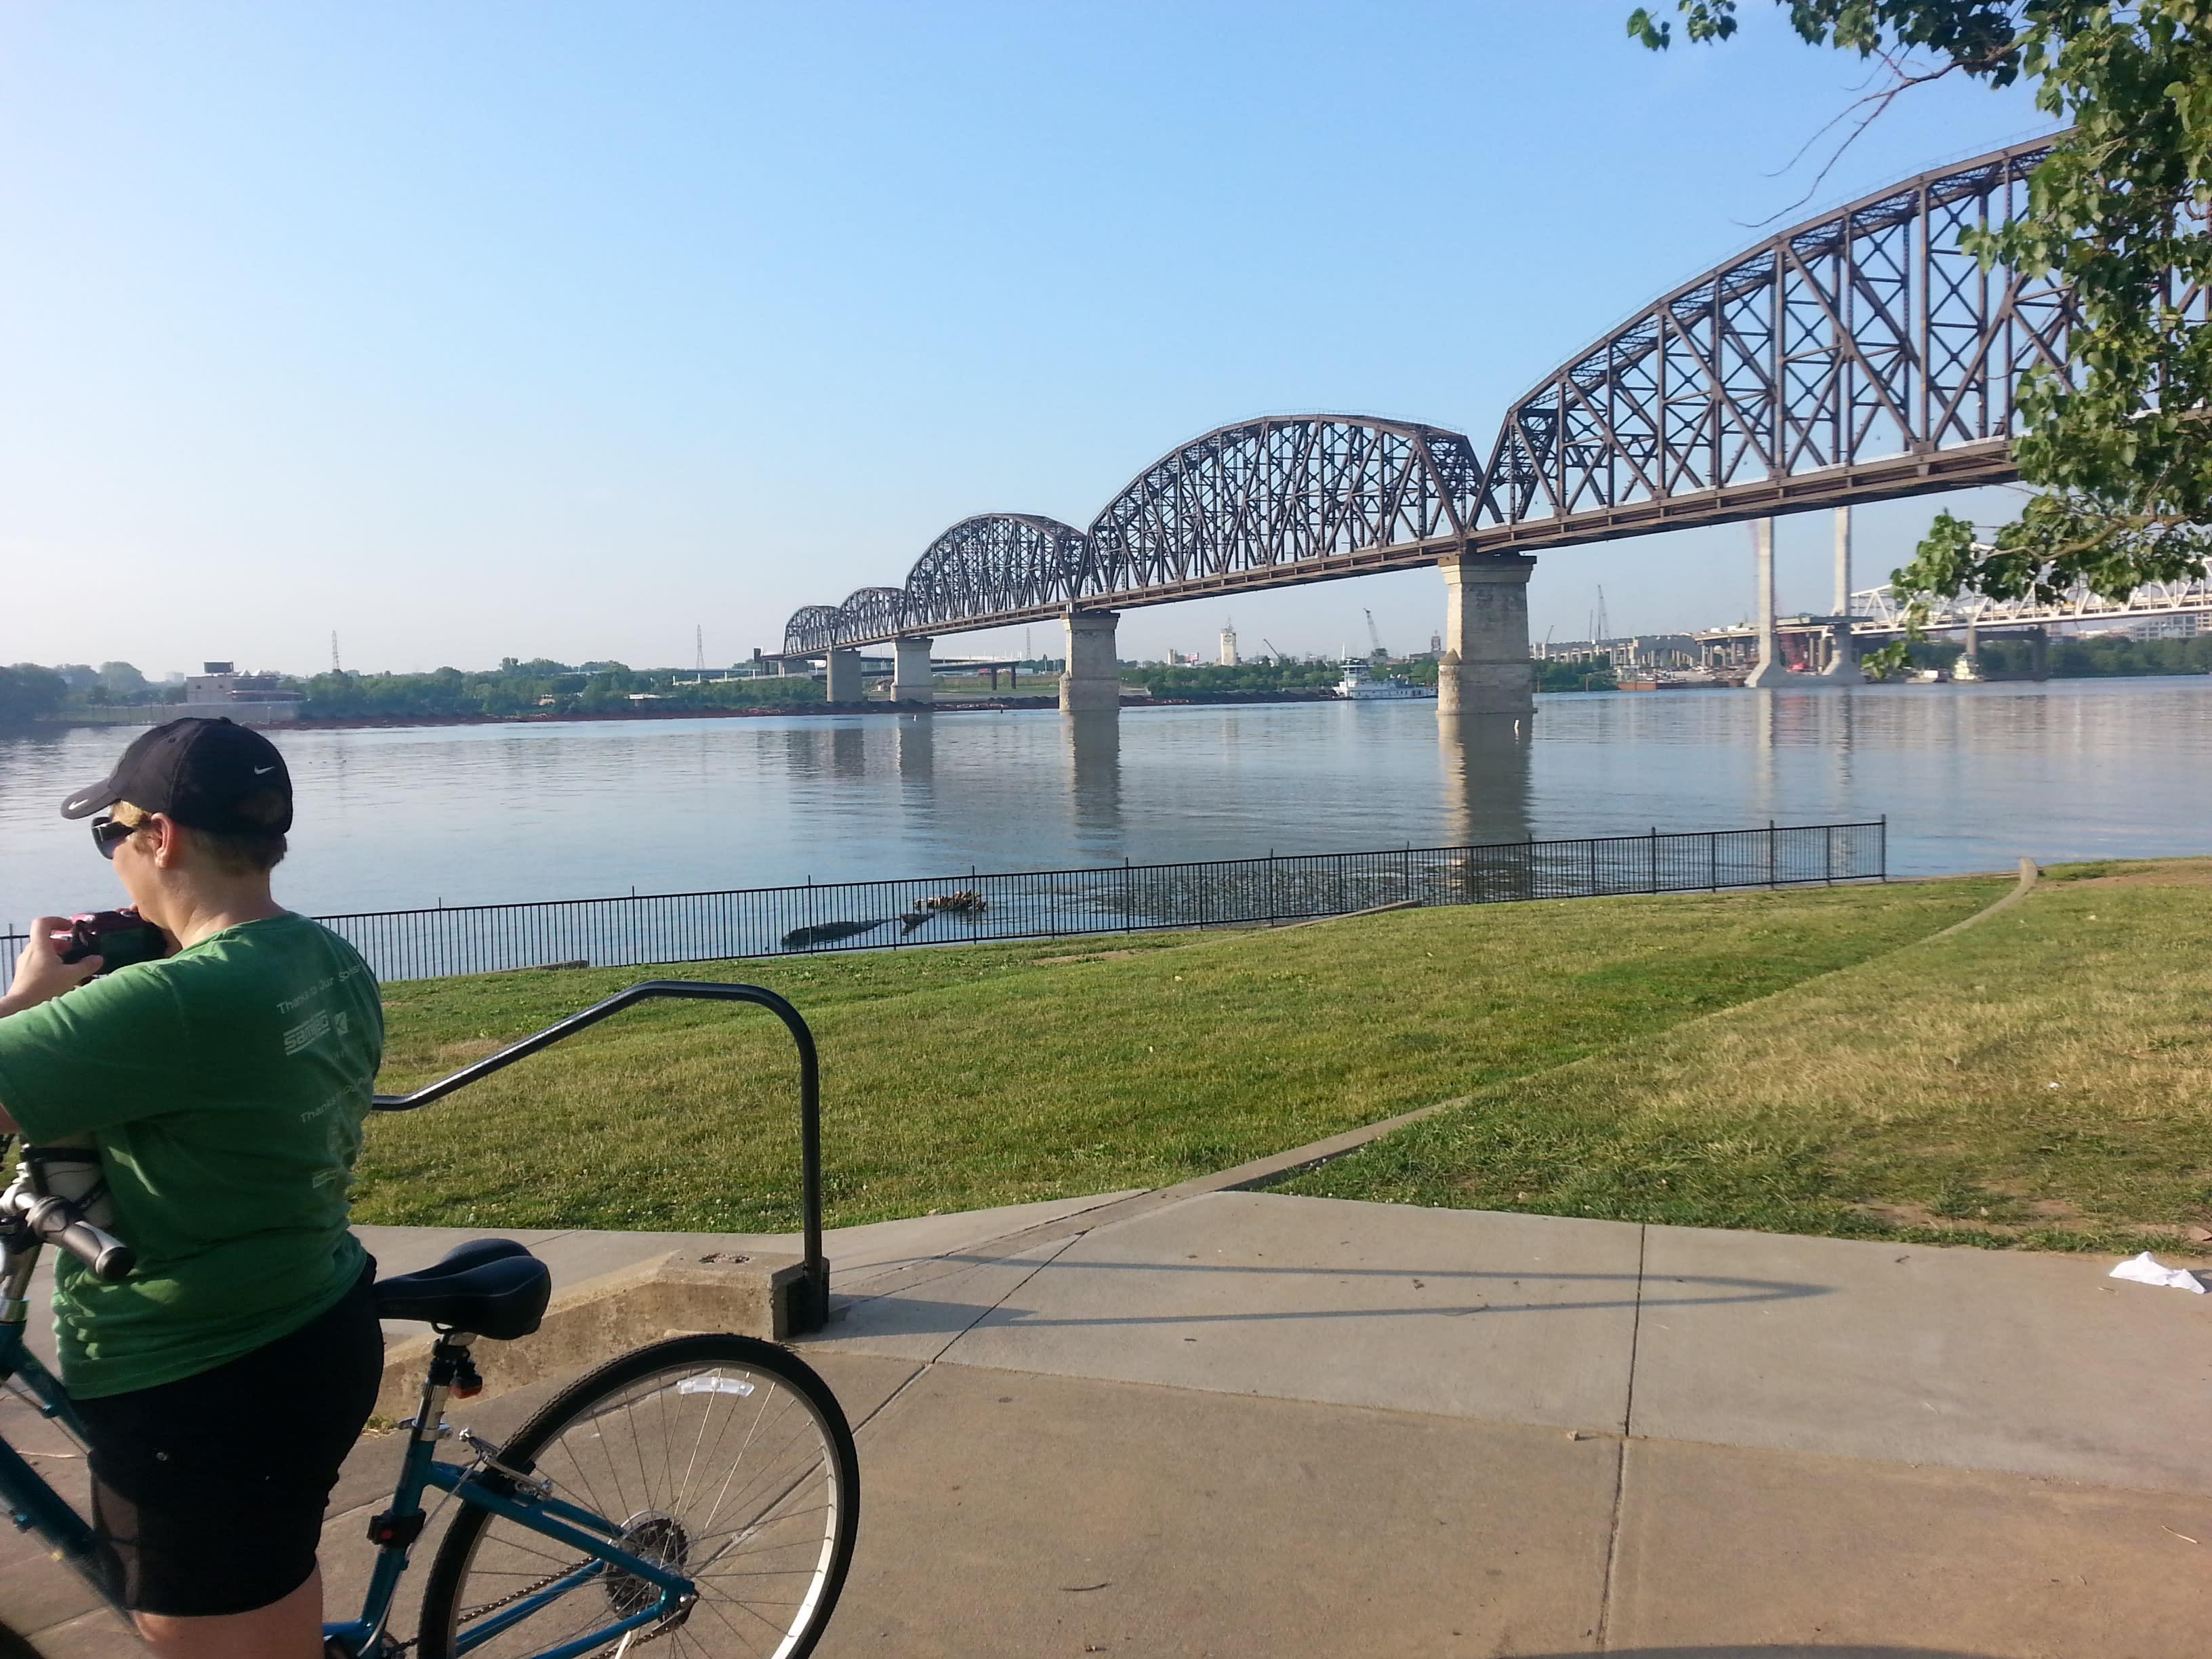 Cyclist on Greenway below Big Four Bridge